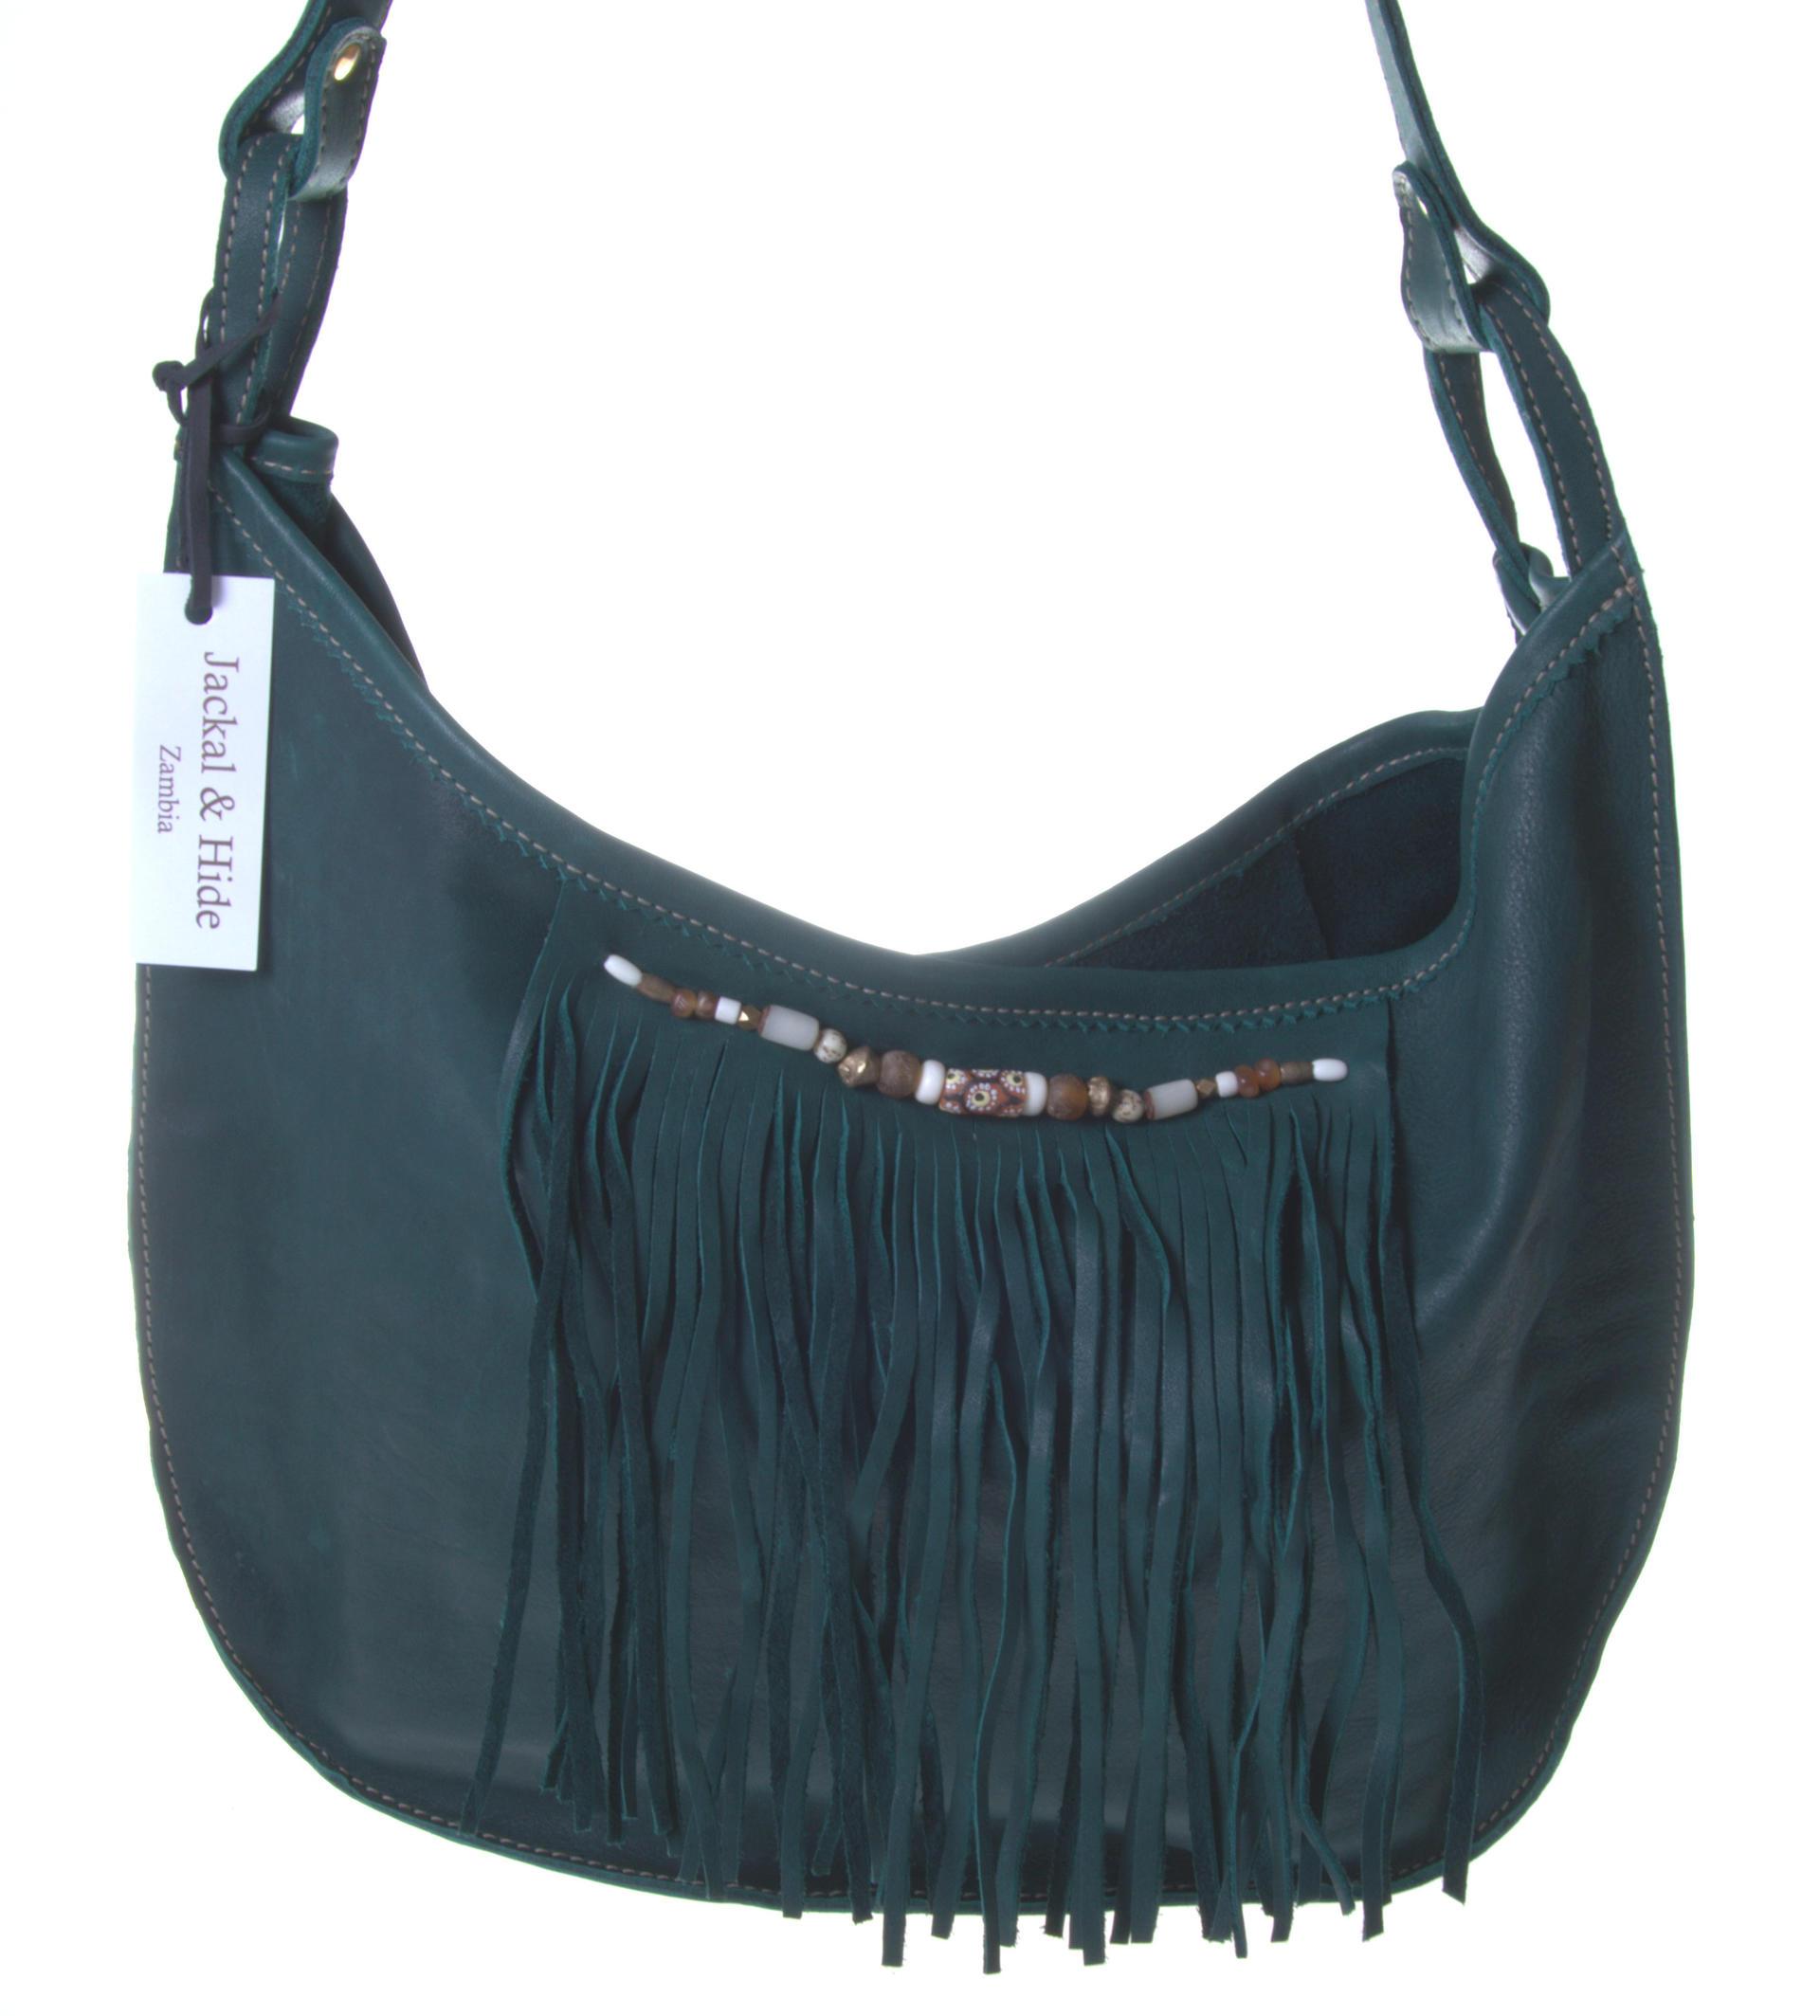 Jackal & Hide - Sambia - Unikat - verschiedene Farben - elegante Handtasche Mini Moon